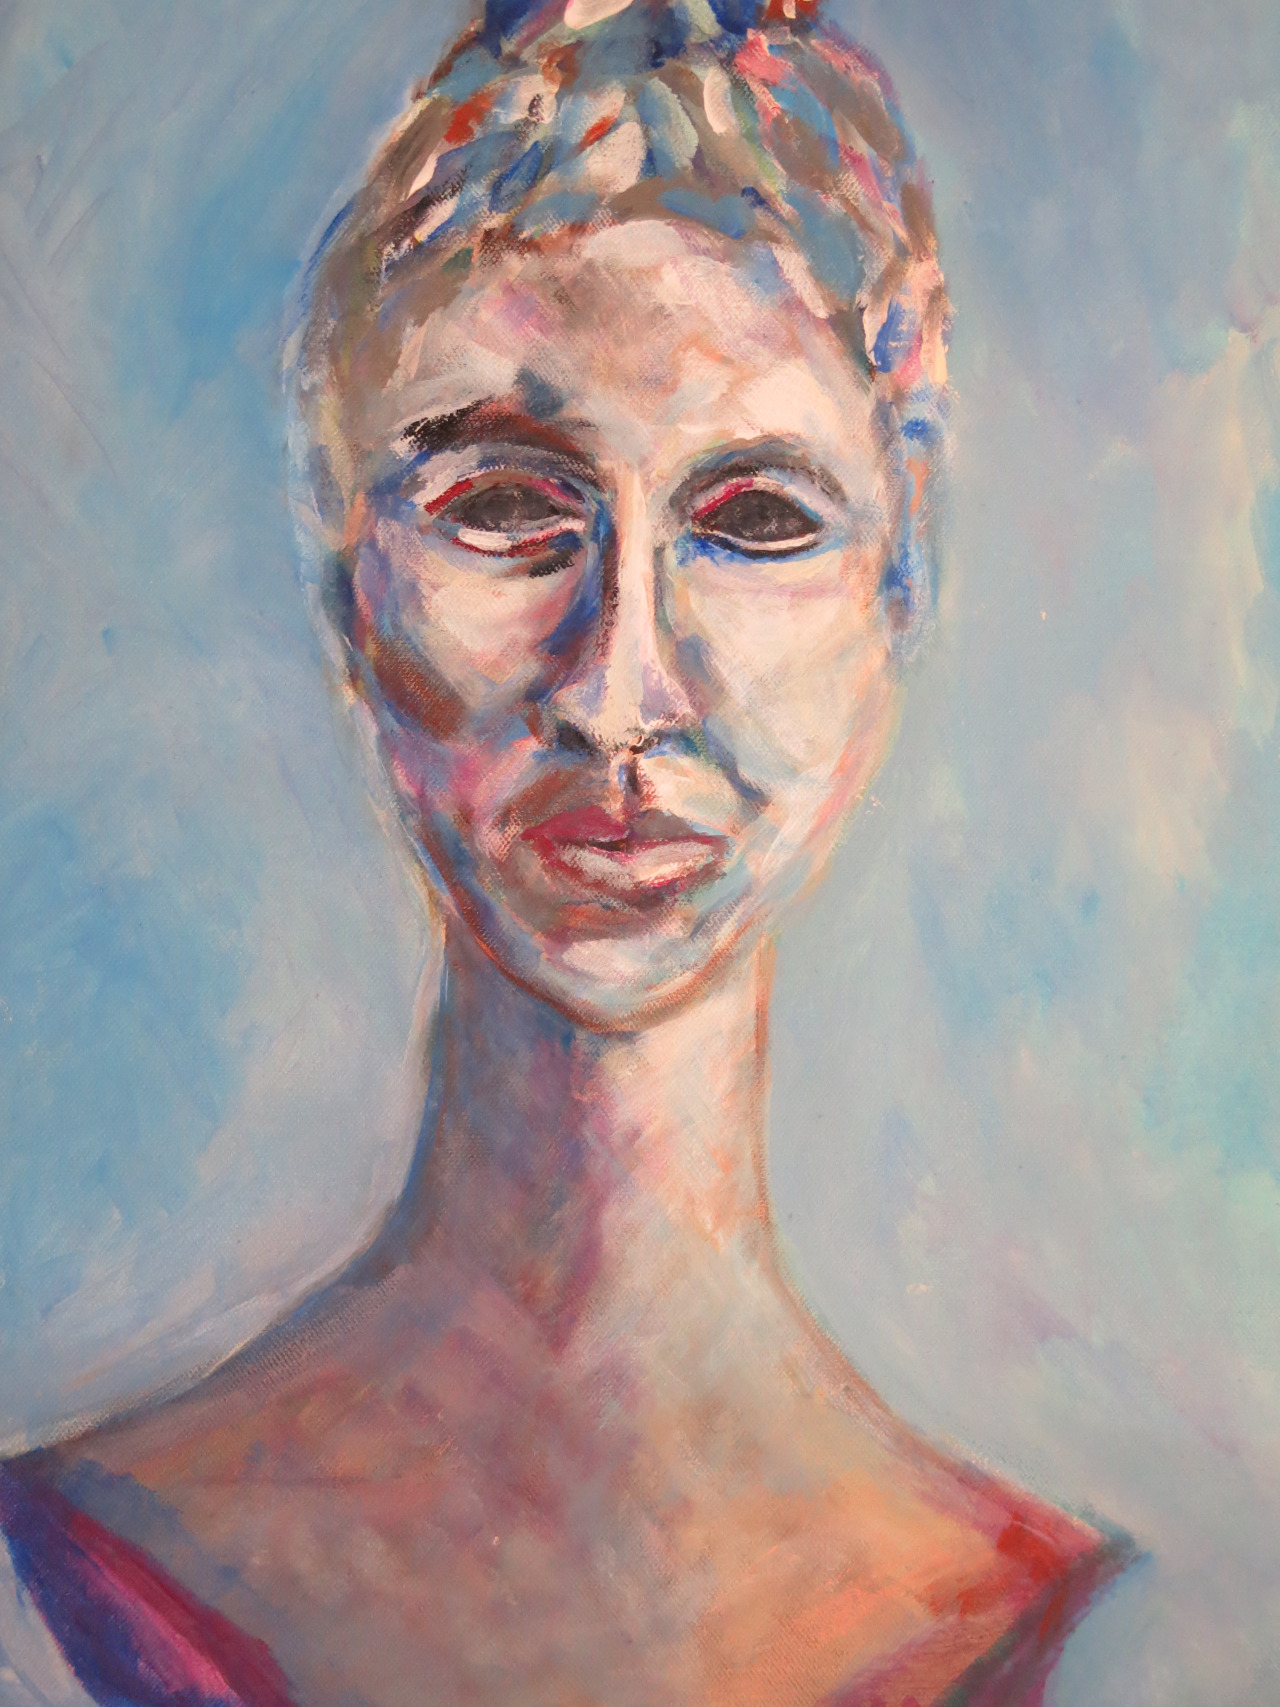 blaue Dame, Acryl auf Leinwand, 50x30 cm, 2014